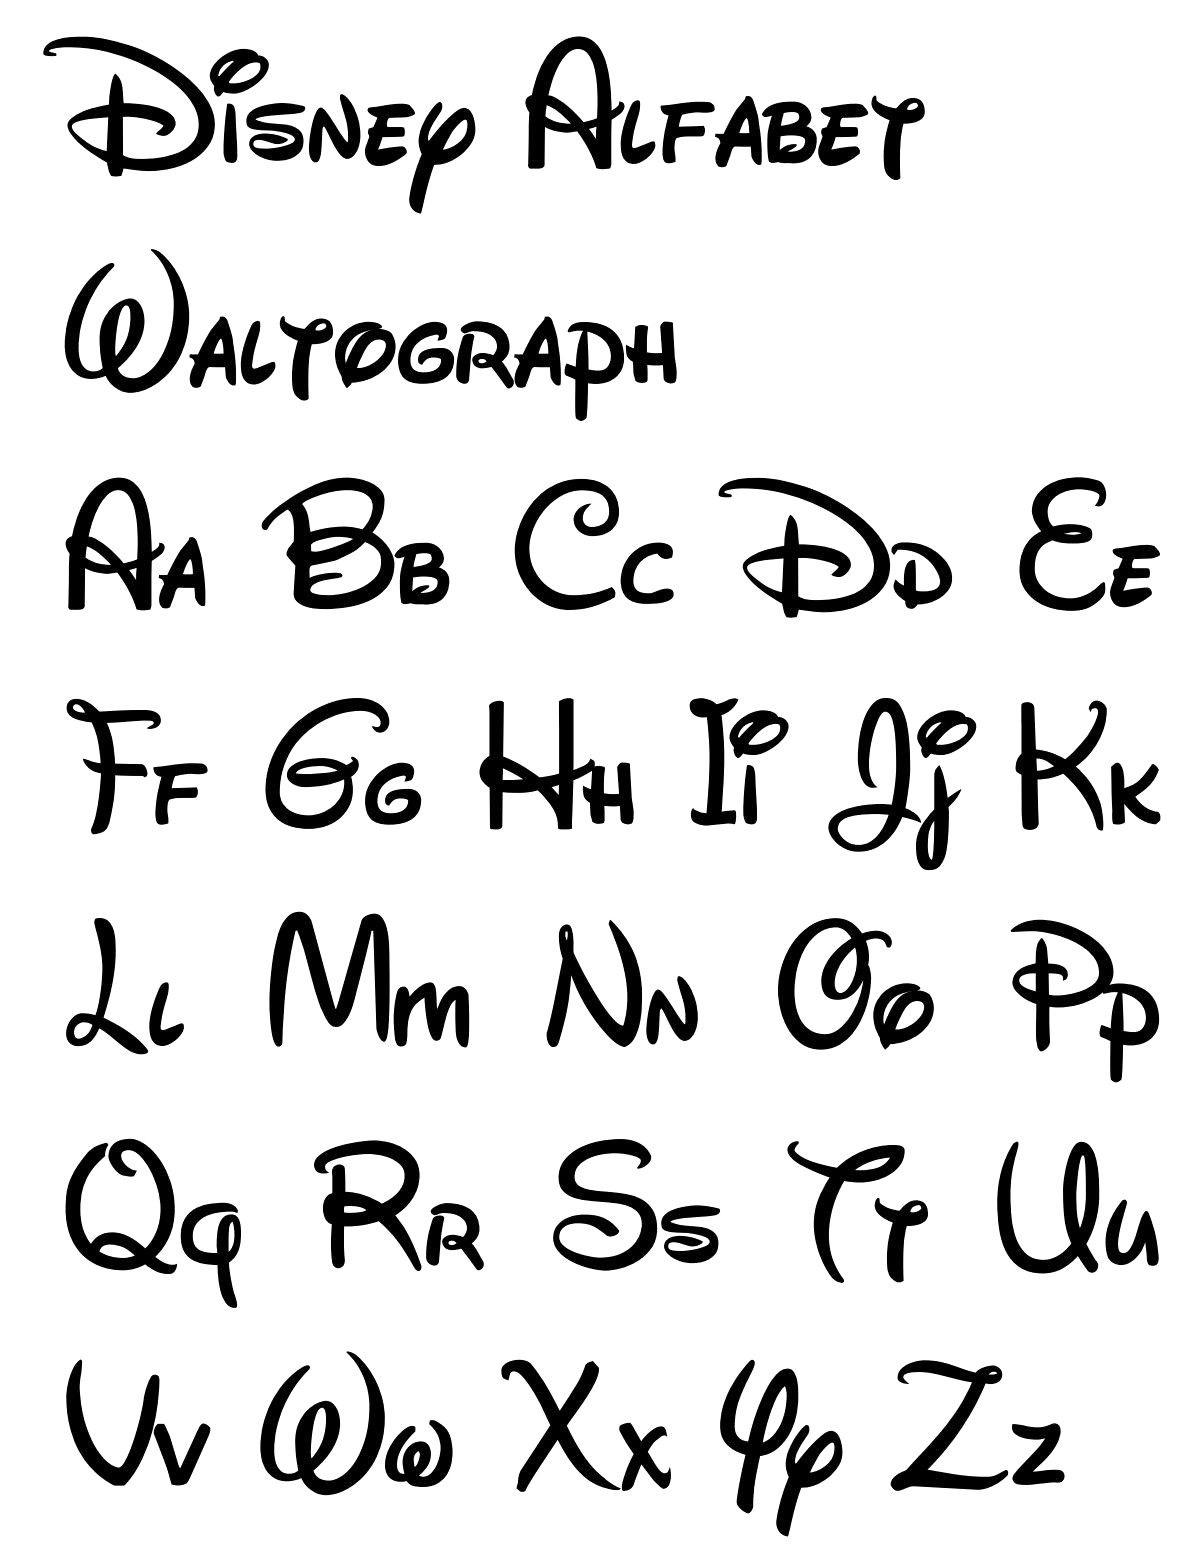 Free Printable Disney Letter Stencils   Disney In 2019   Disney - Free Printable Disney Font Stencils